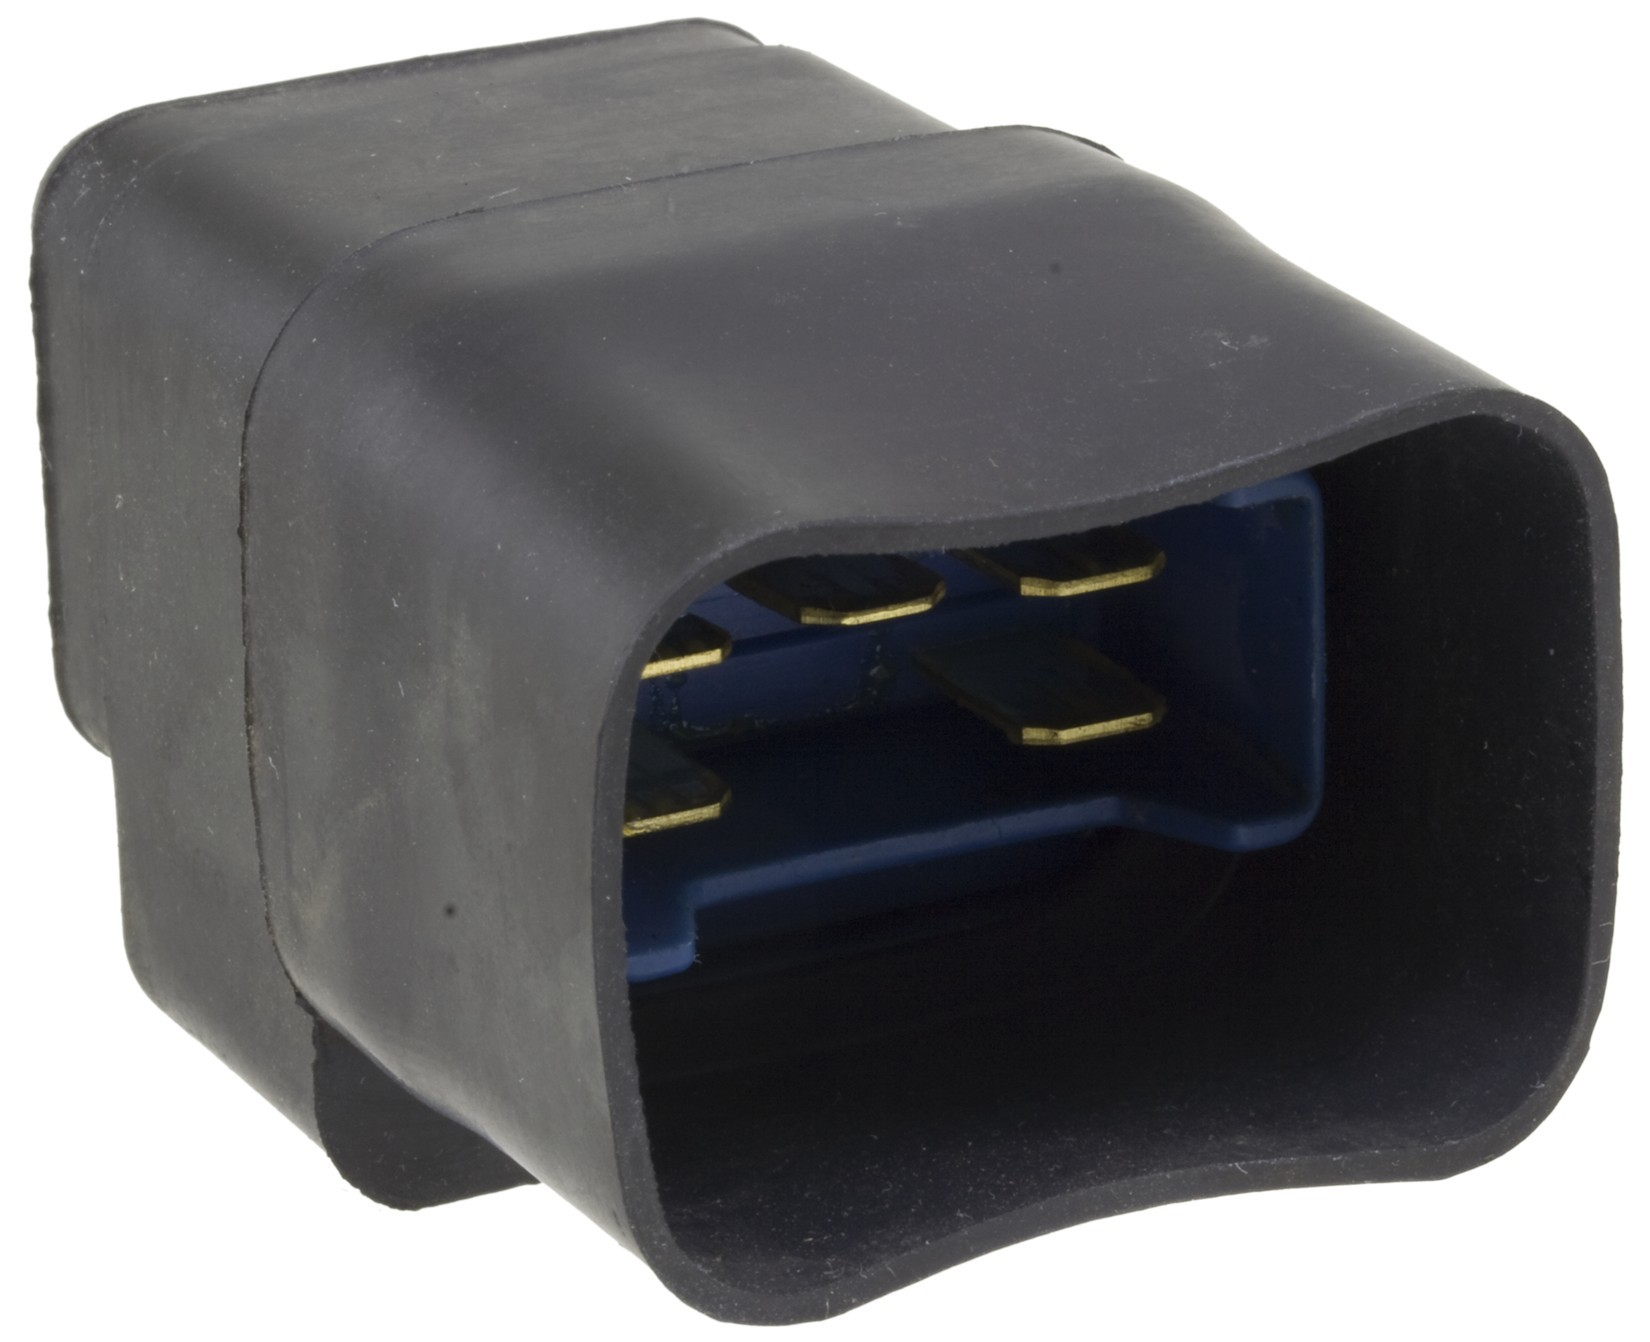 Windshield wiper motor relay airtex 1r1457 ebay for Windshield wiper motor relay